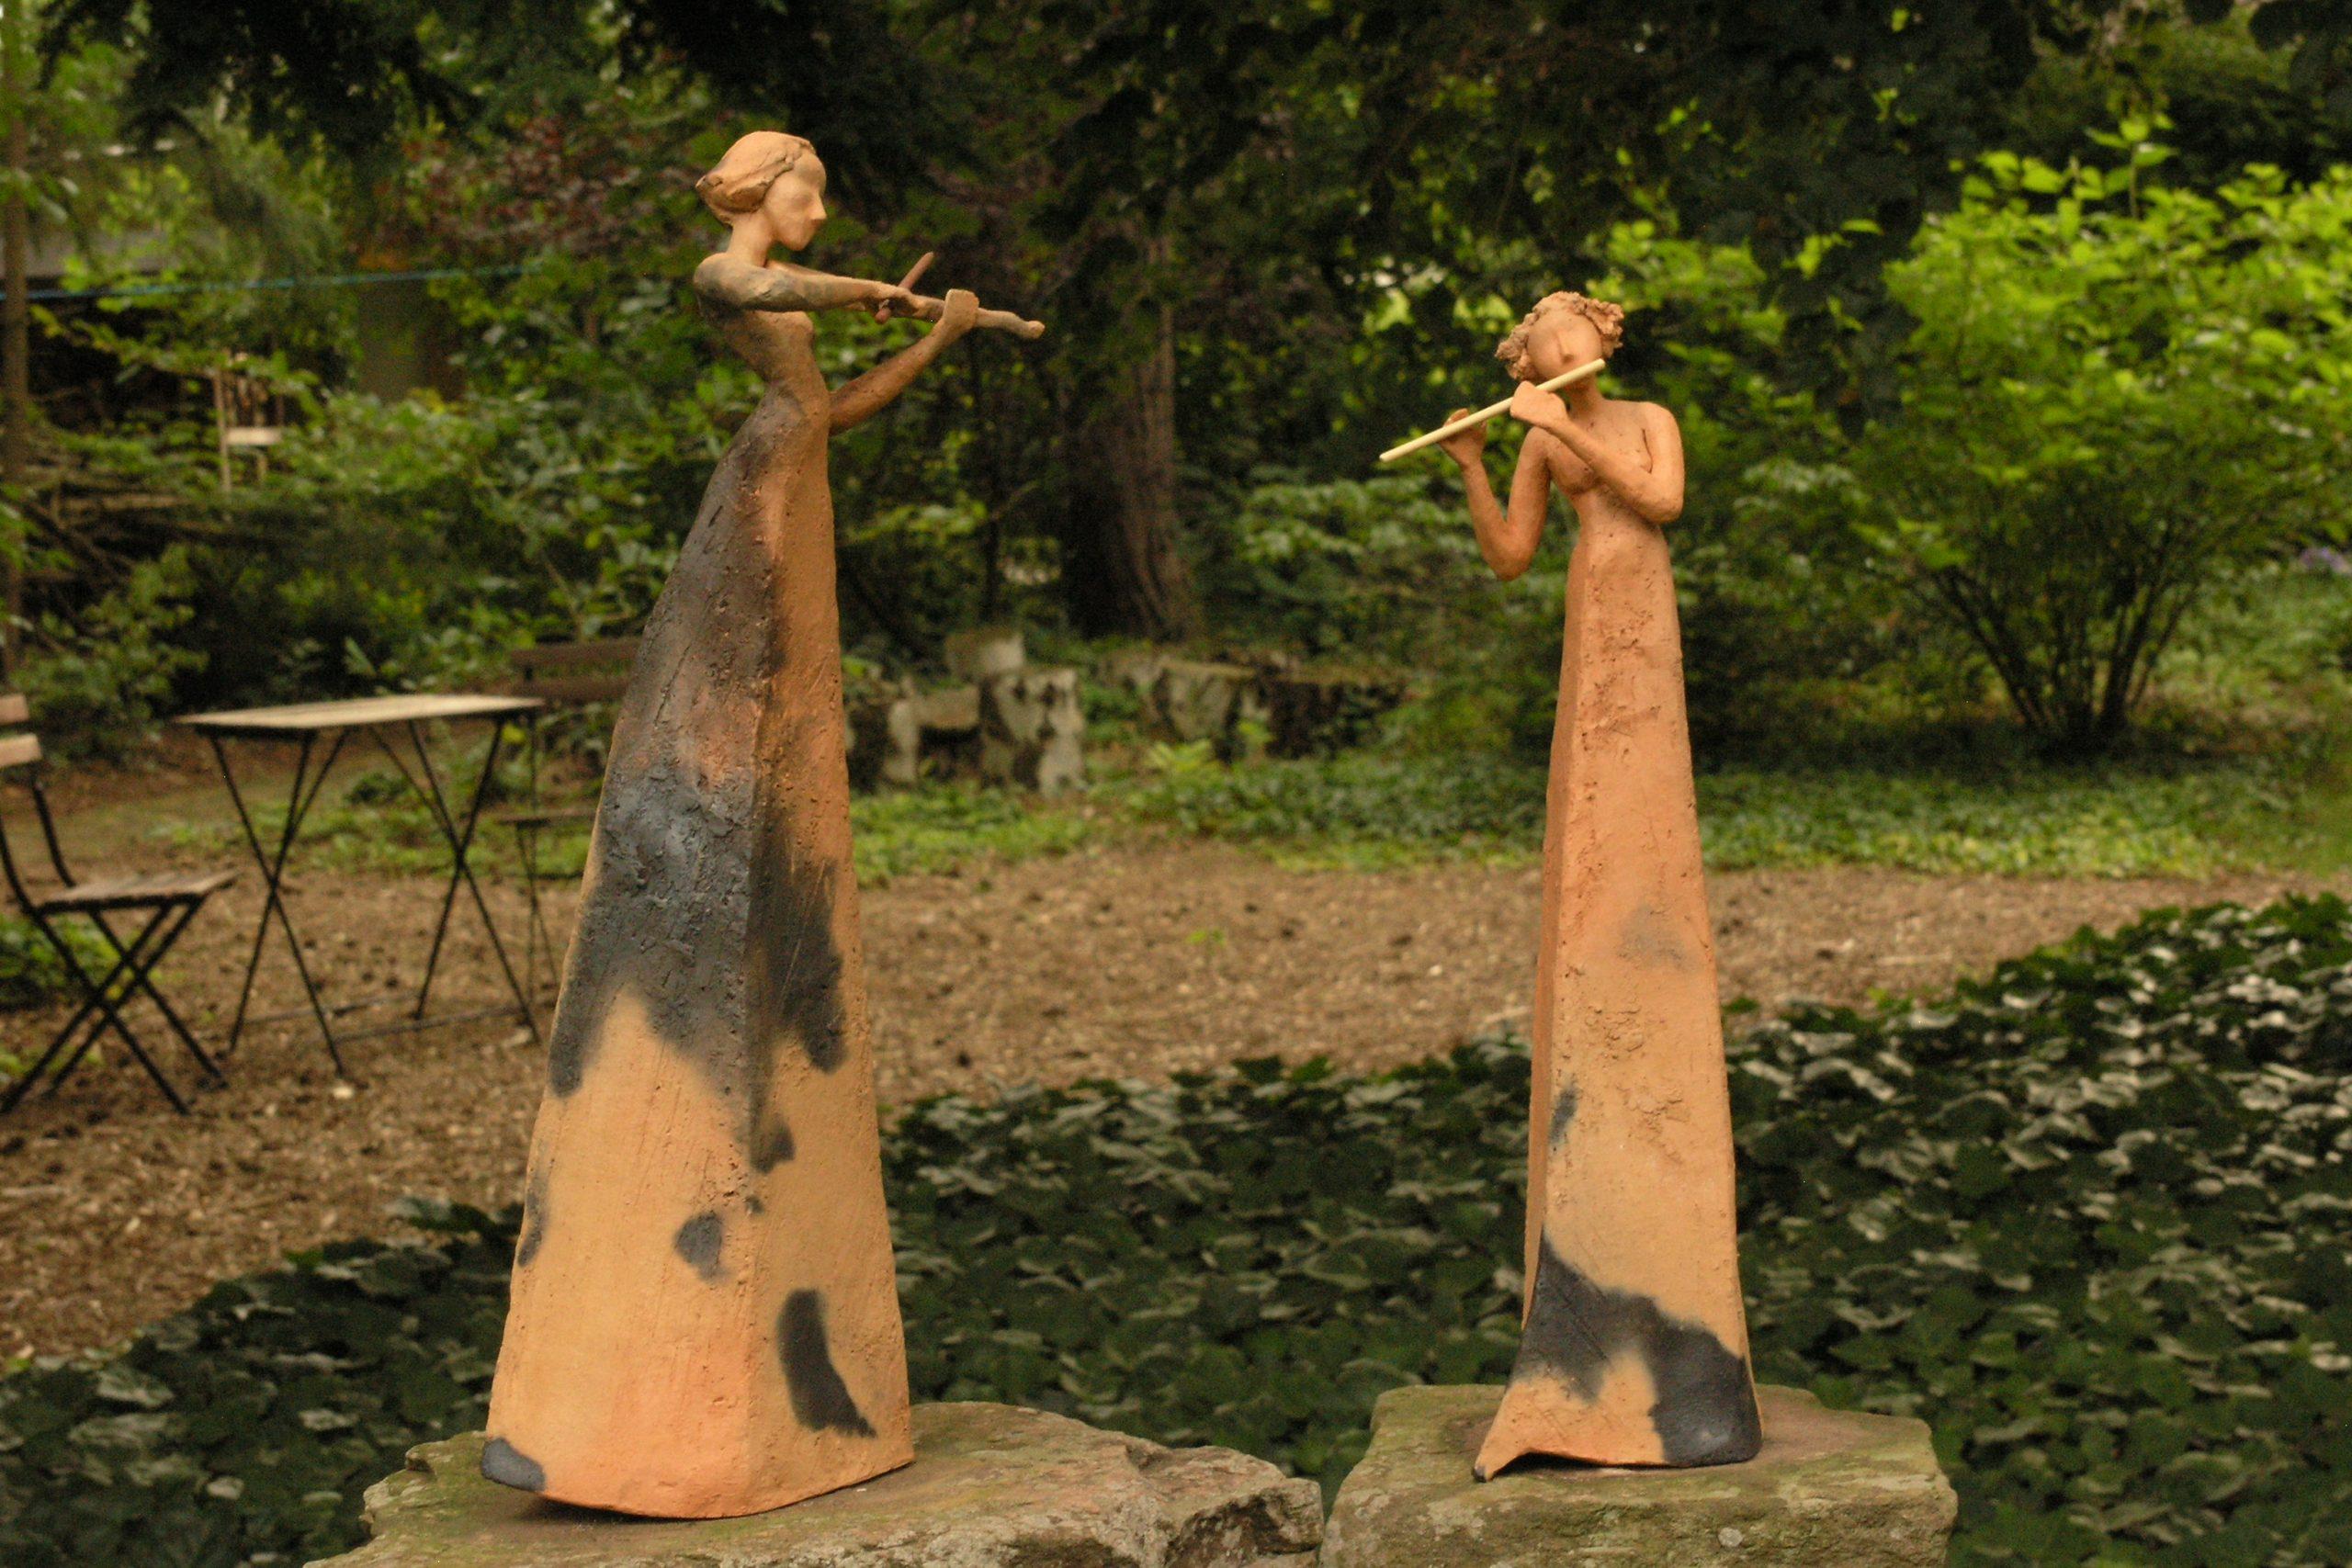 Full Size of Garten Skulpturen Gartenskulpturen Stein Kaufen Aus Modern Skulptur Beton Edelstahl Holz Metall Steinguss Taal Keramik Lärmschutzwand Kosten Trampolin Garten Garten Skulpturen